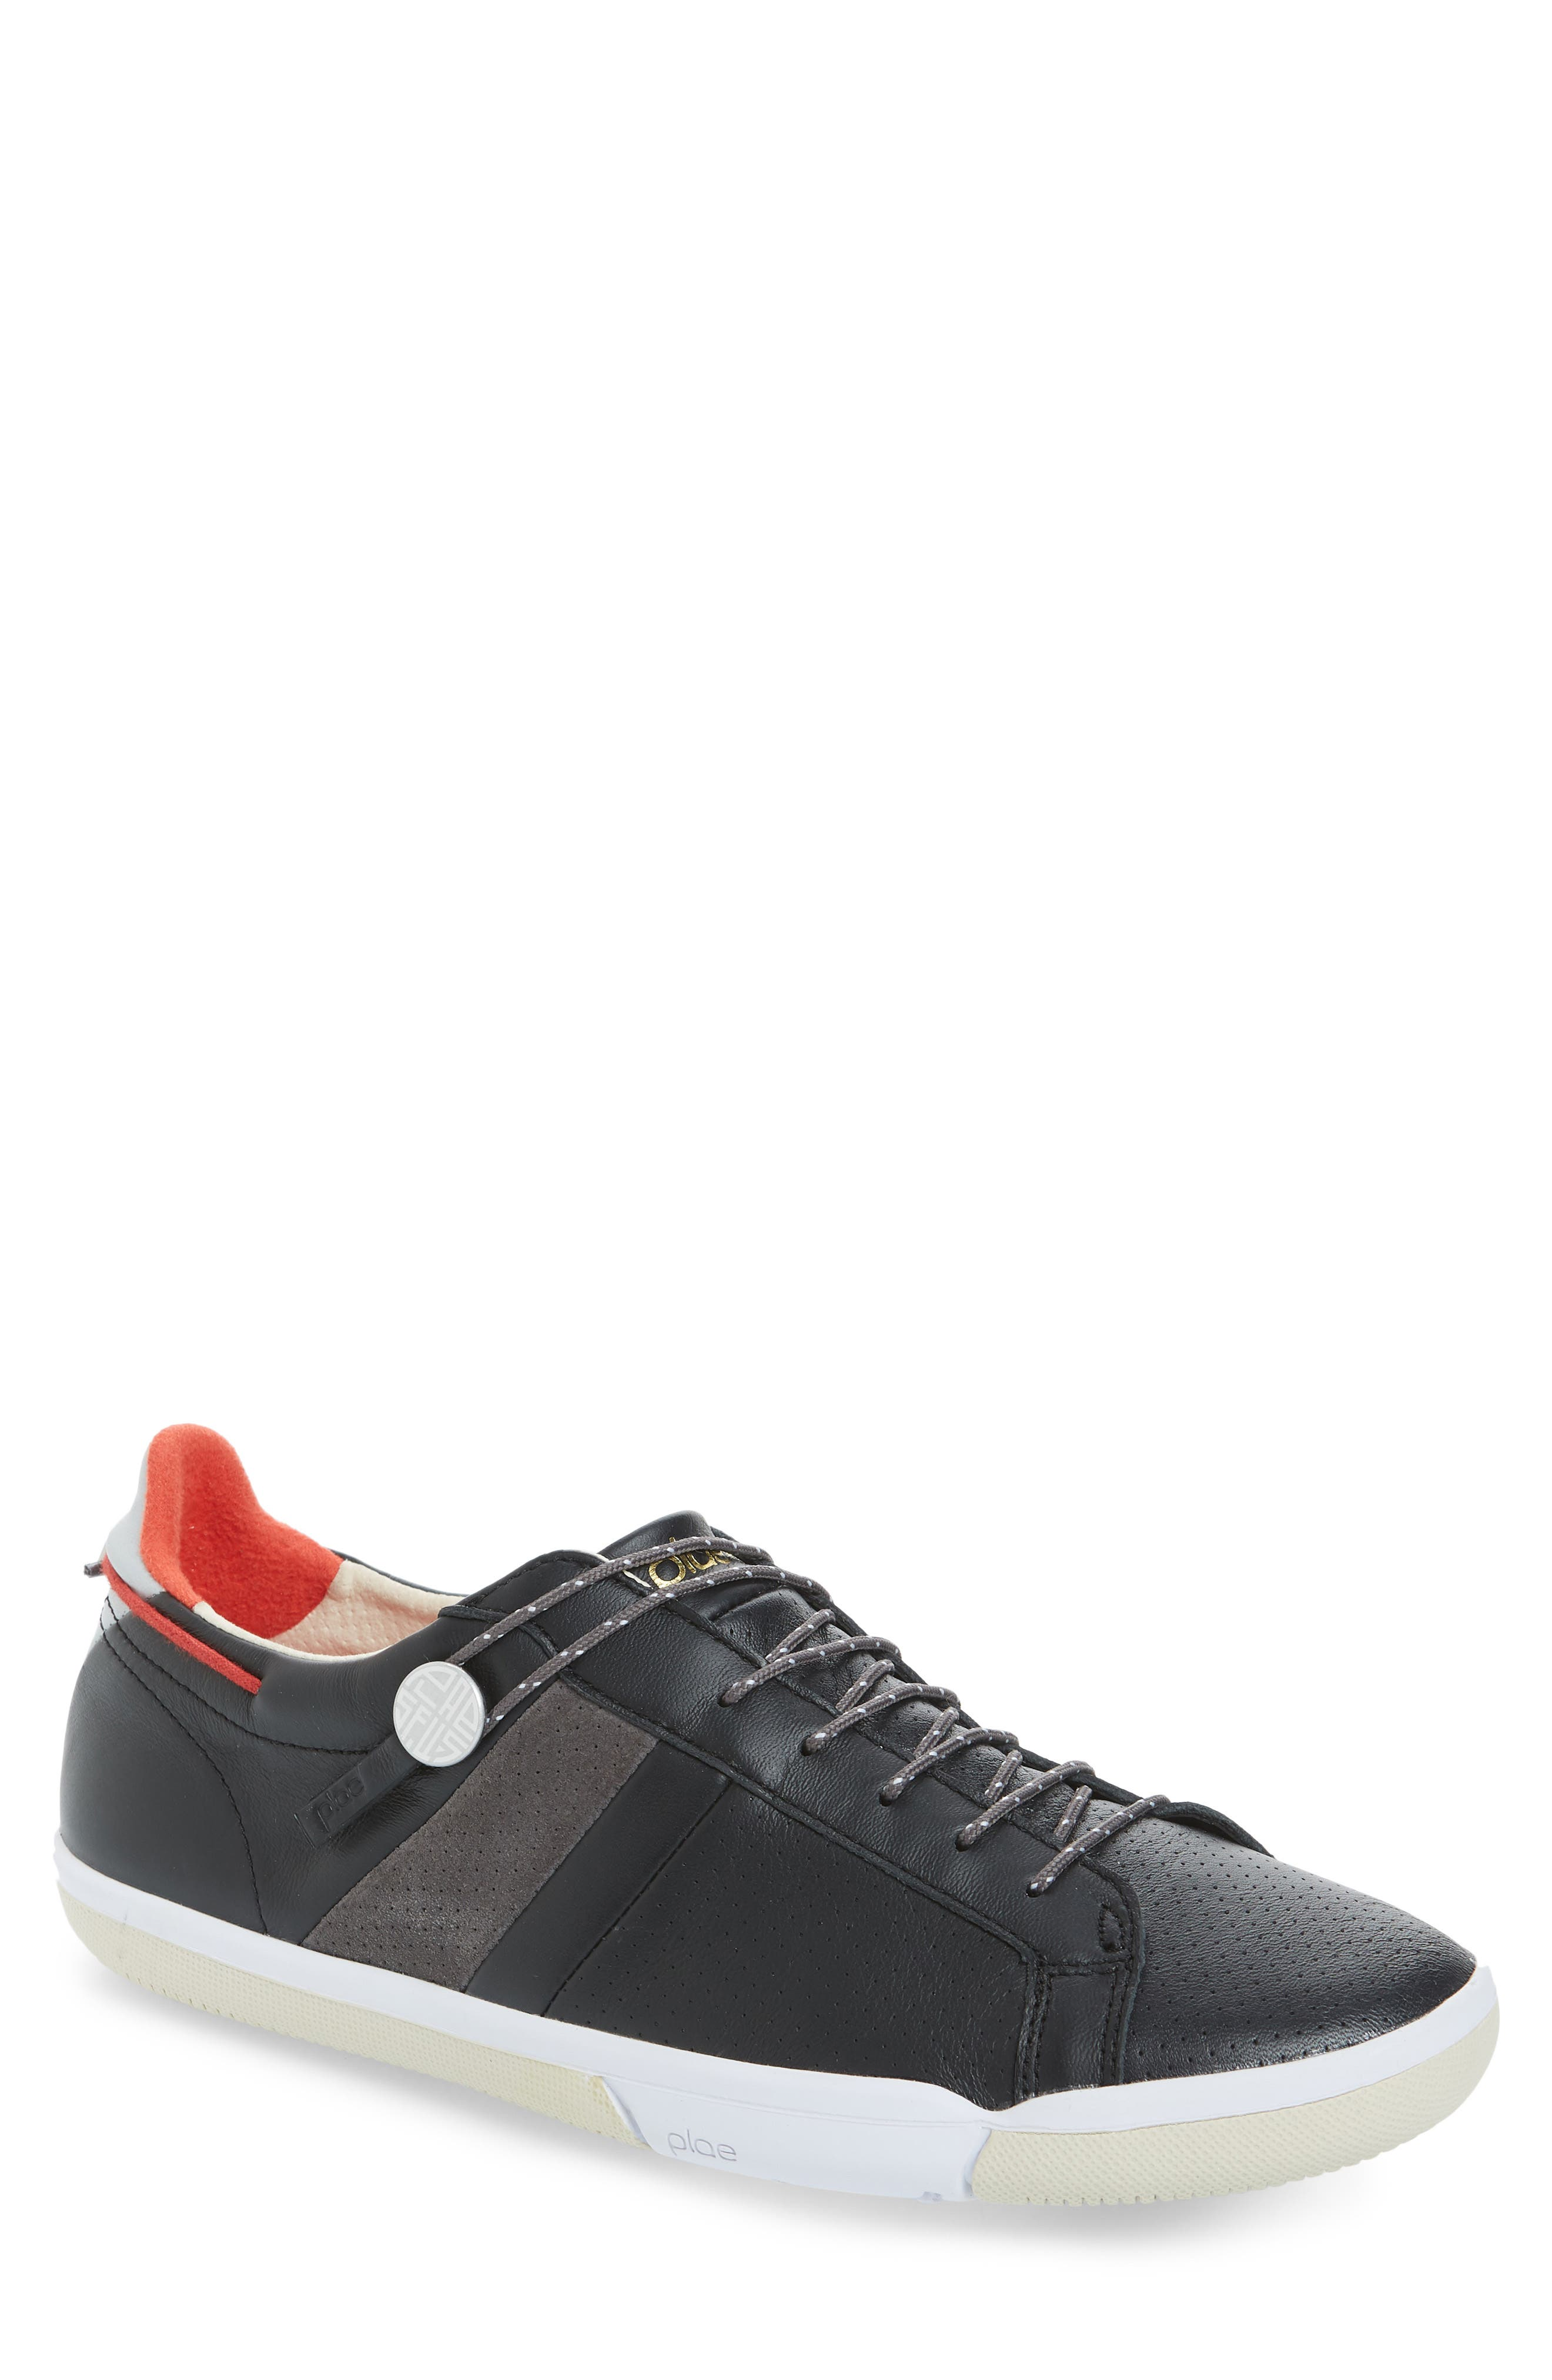 Mulberry Low Top Sneaker,                             Main thumbnail 1, color,                             BLACK